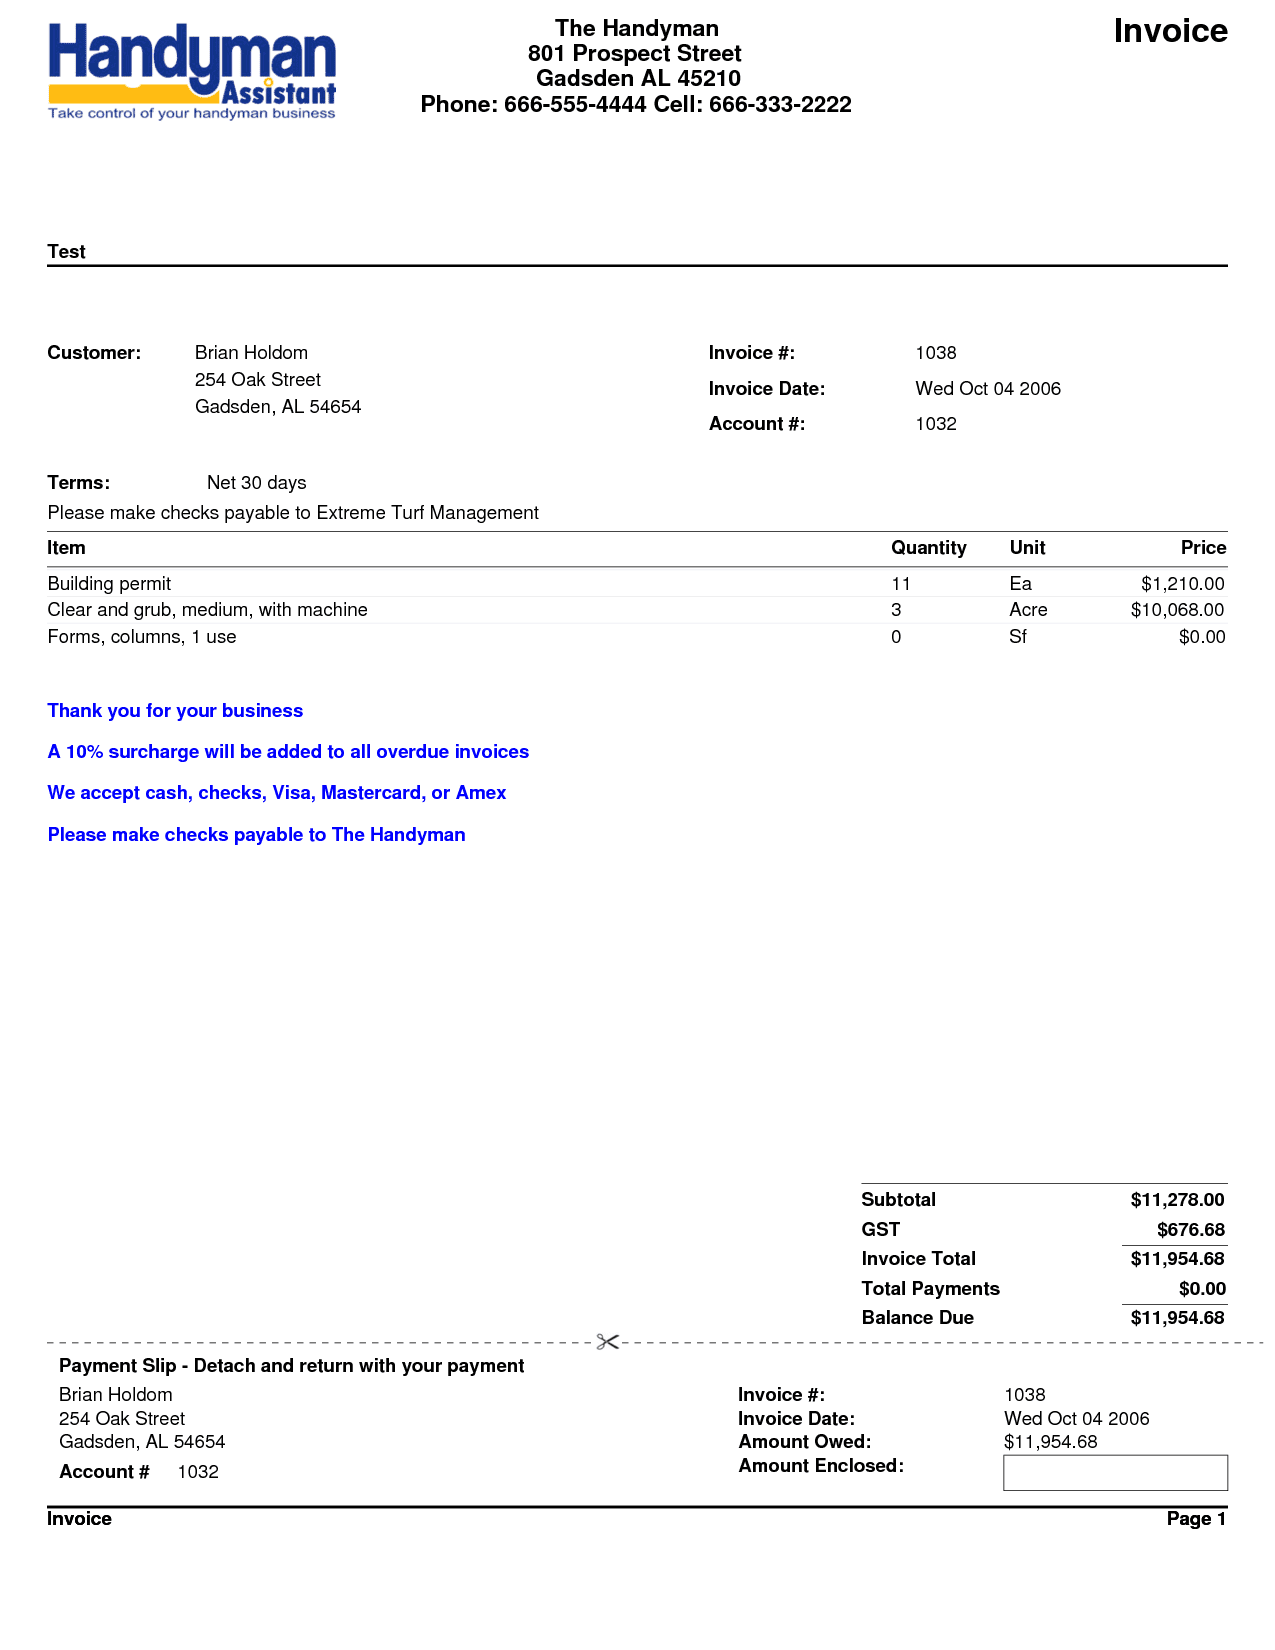 Handyman Invoice